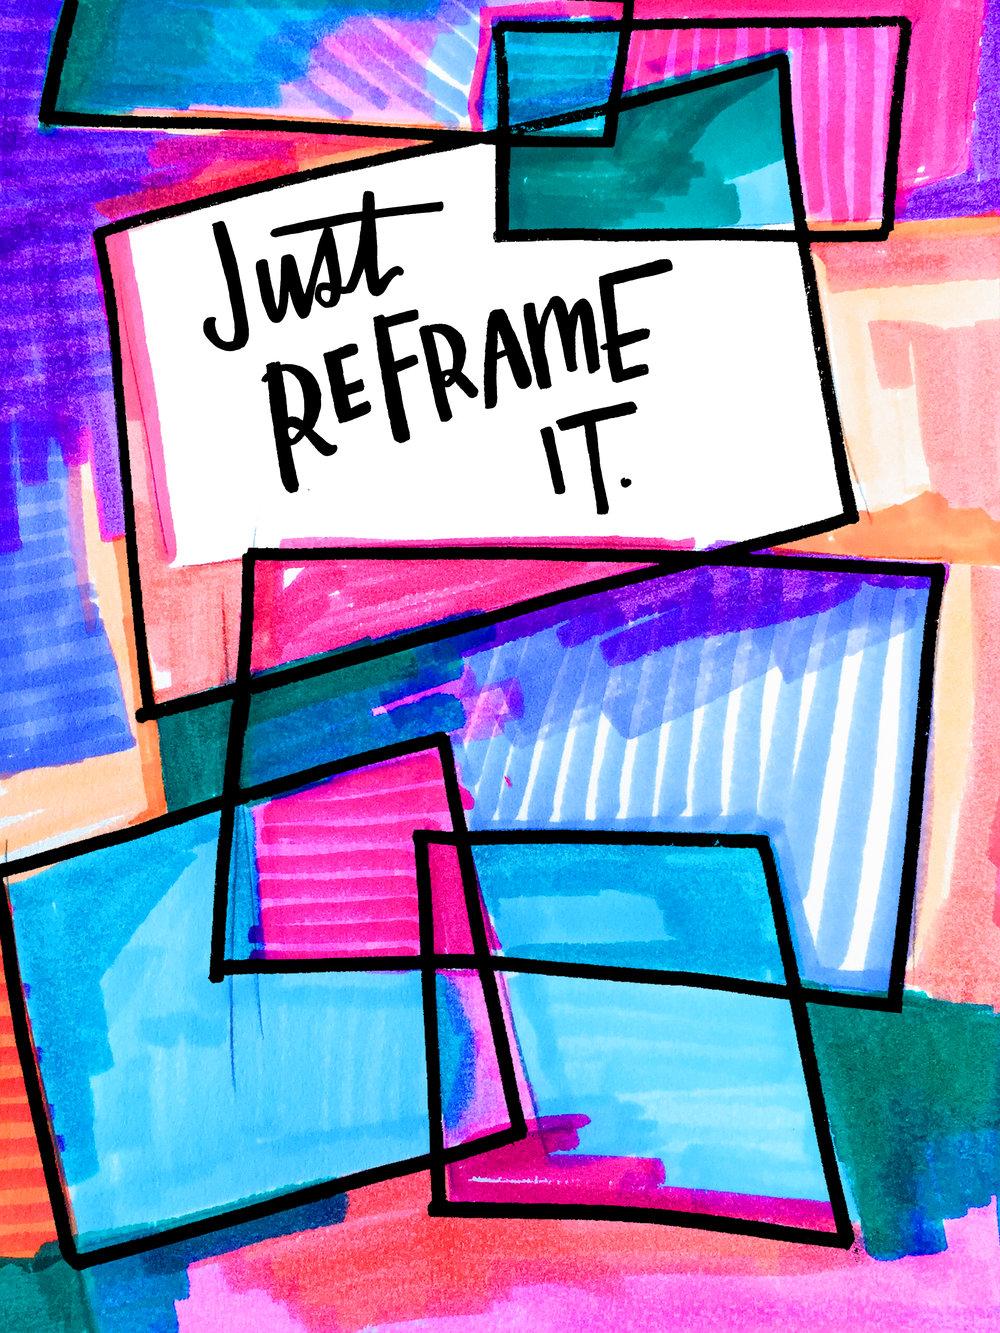 2/2/16: Reframe